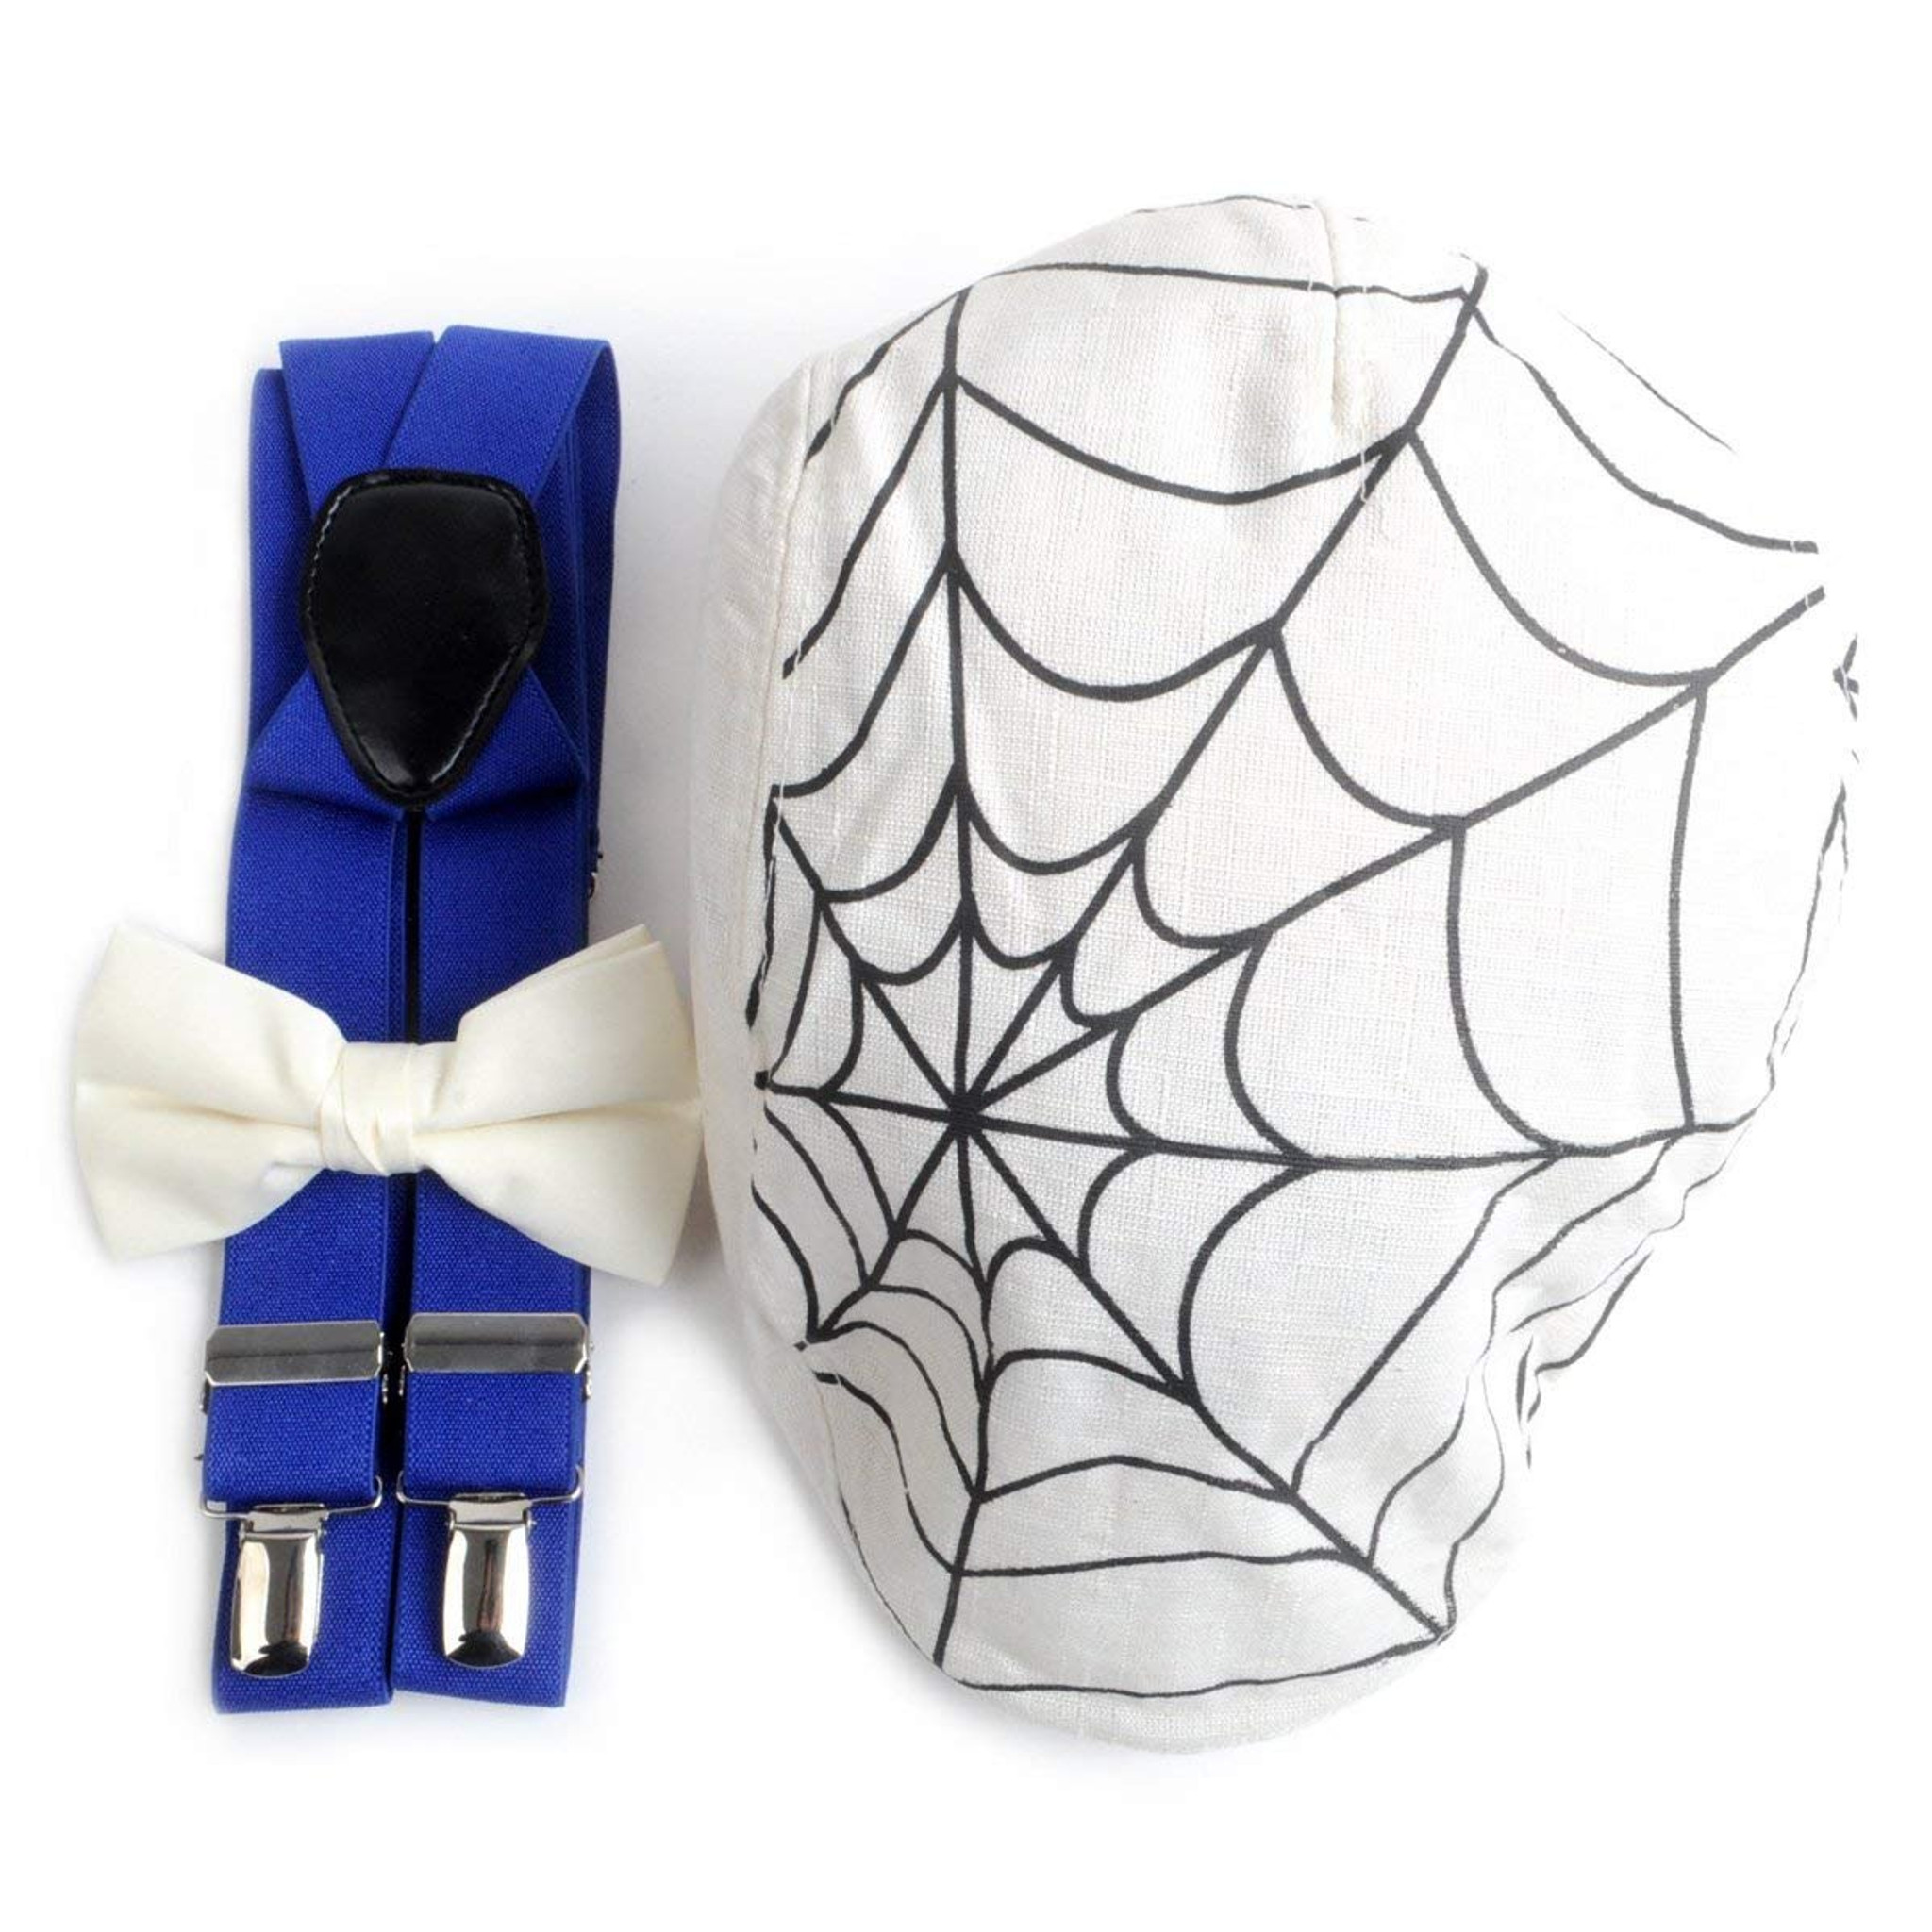 Spider Web Suspenders